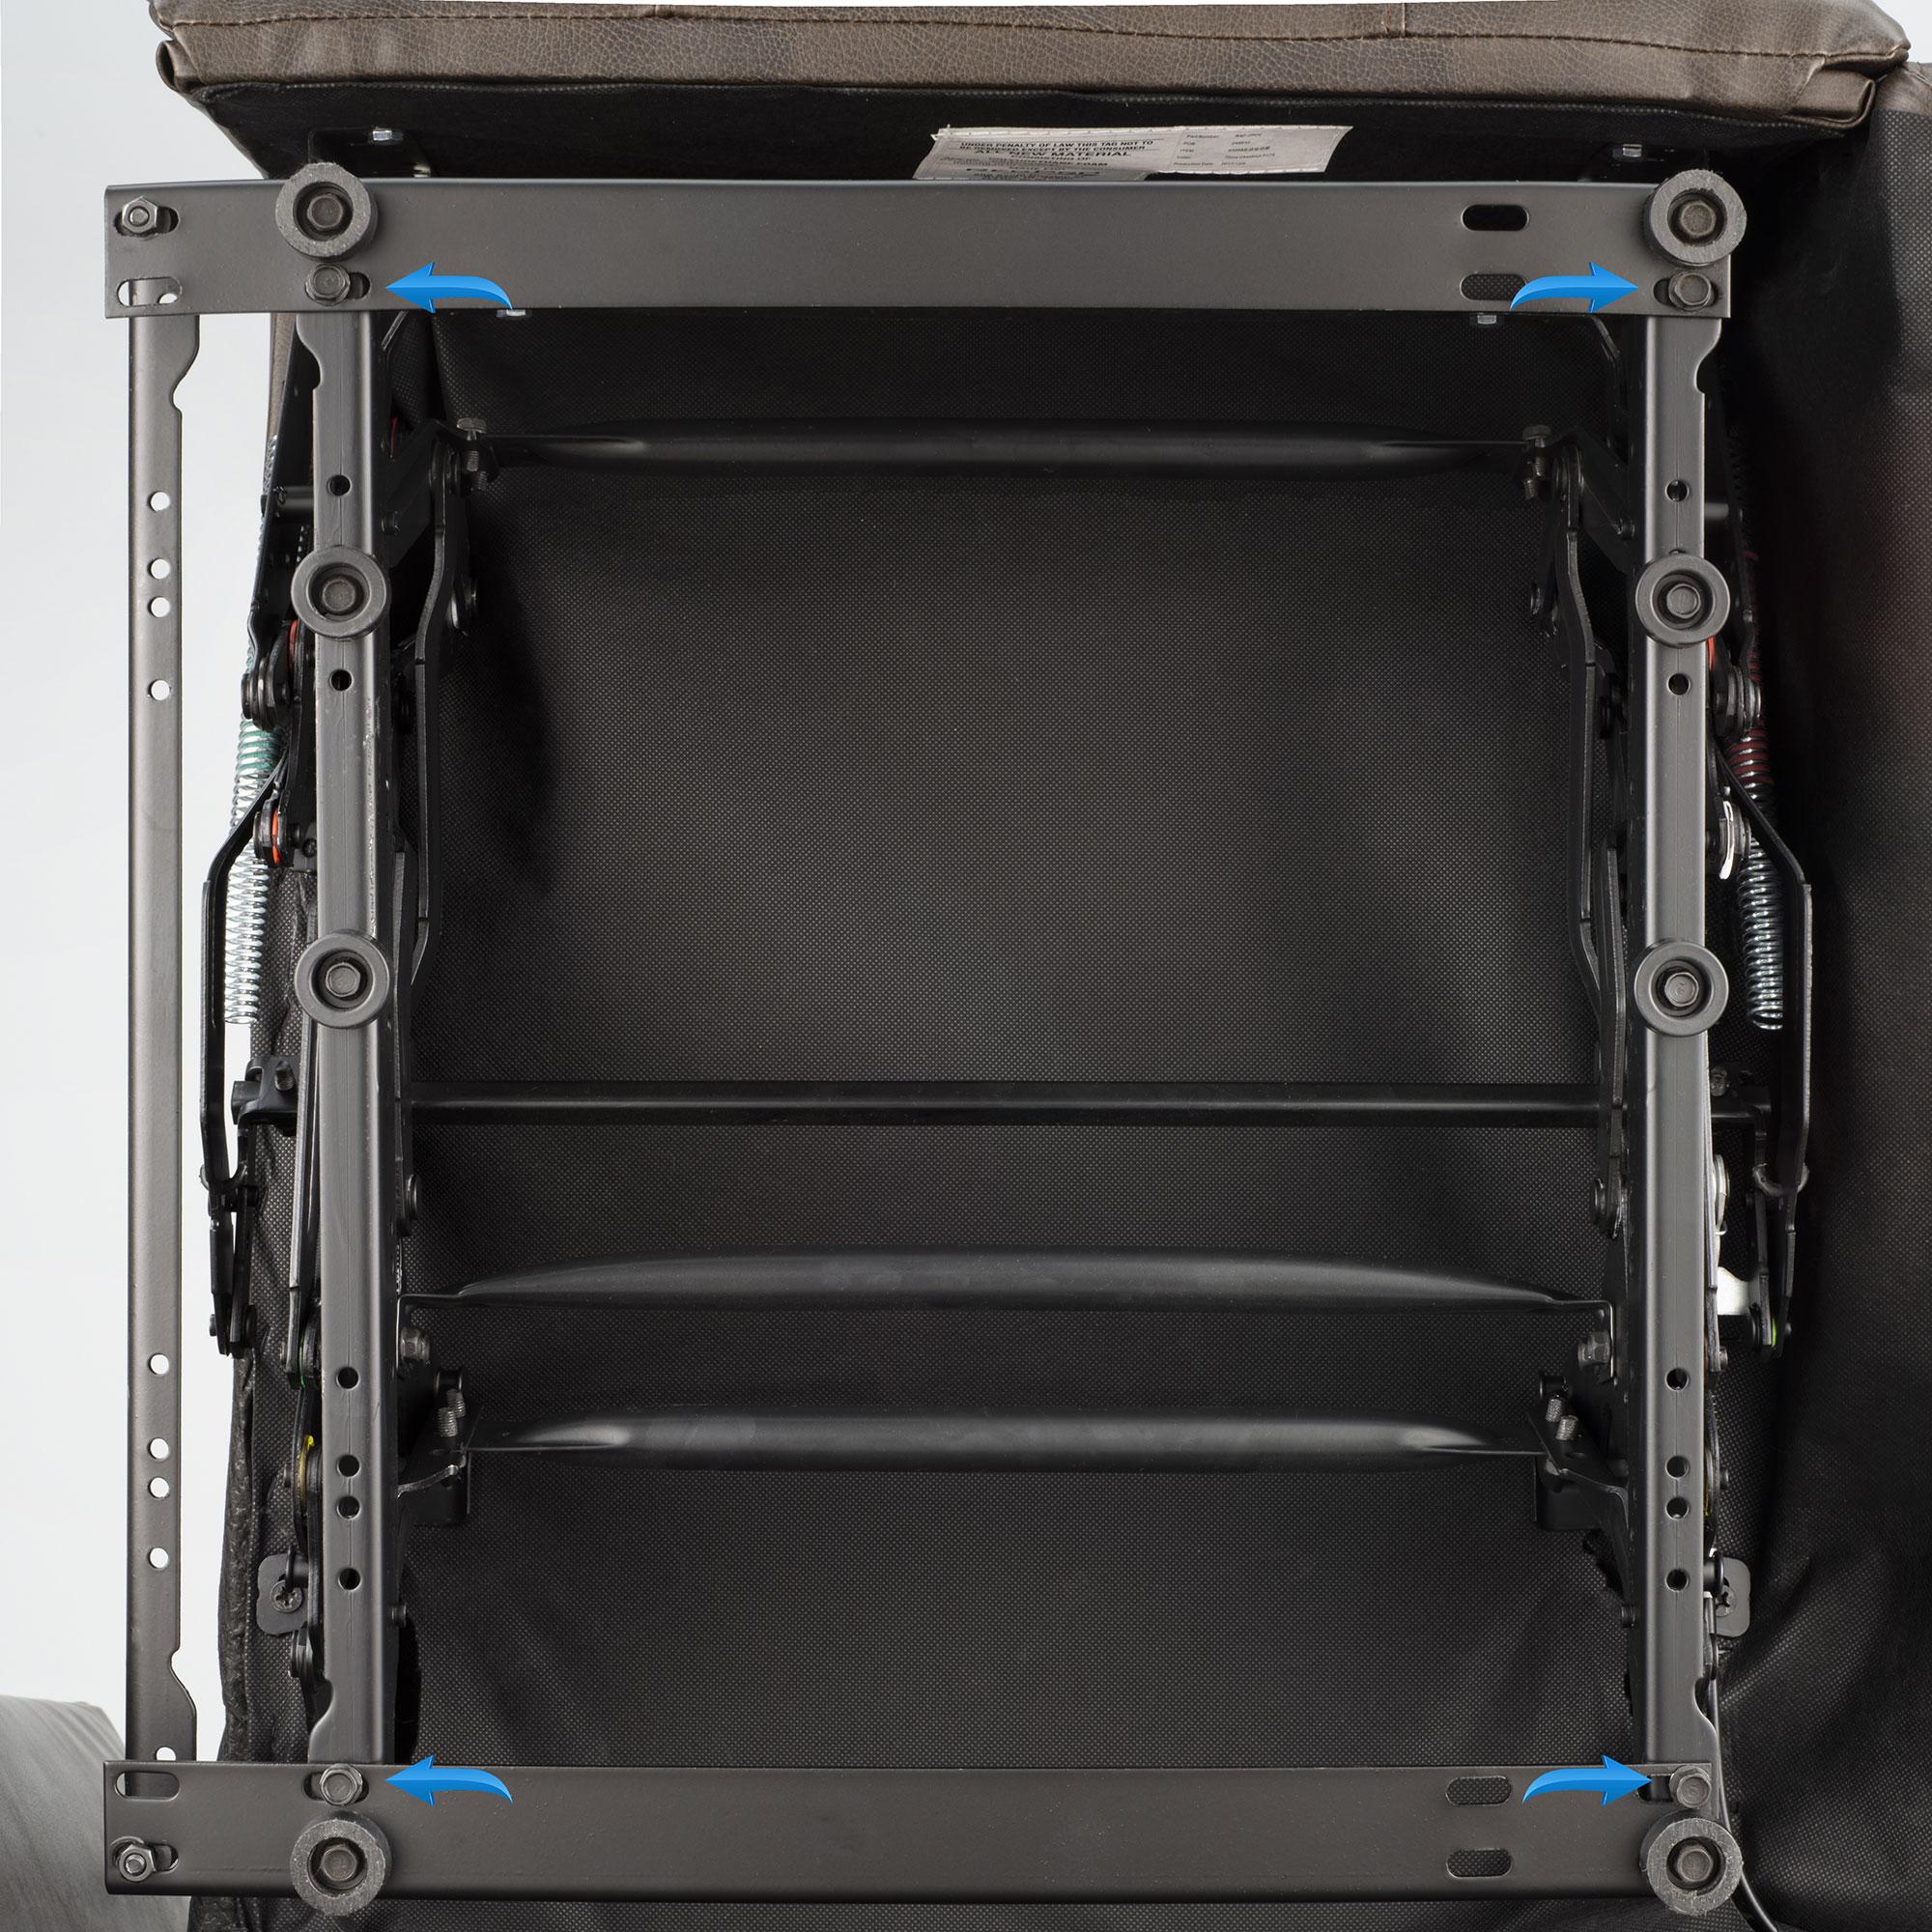 complete-bottom-of-rv-furniture.jpg